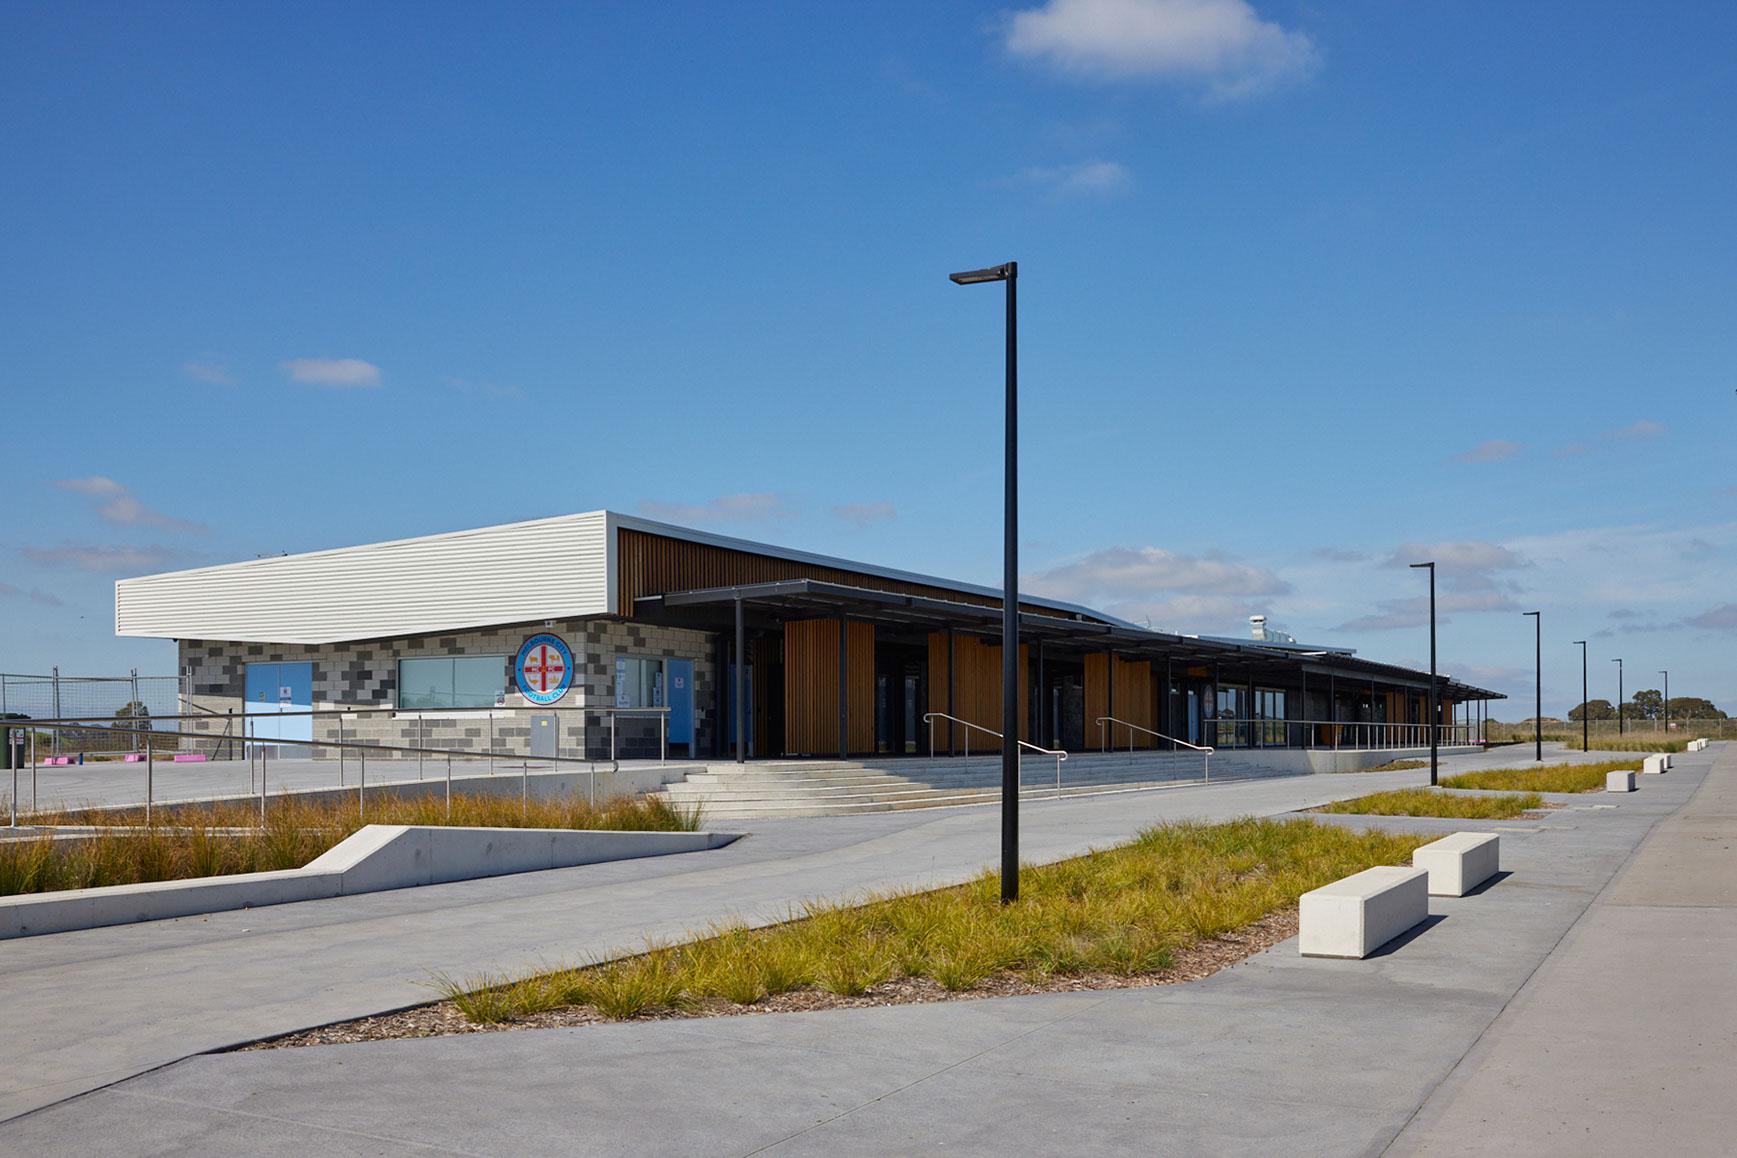 2Construct - Casey Field Pavilion